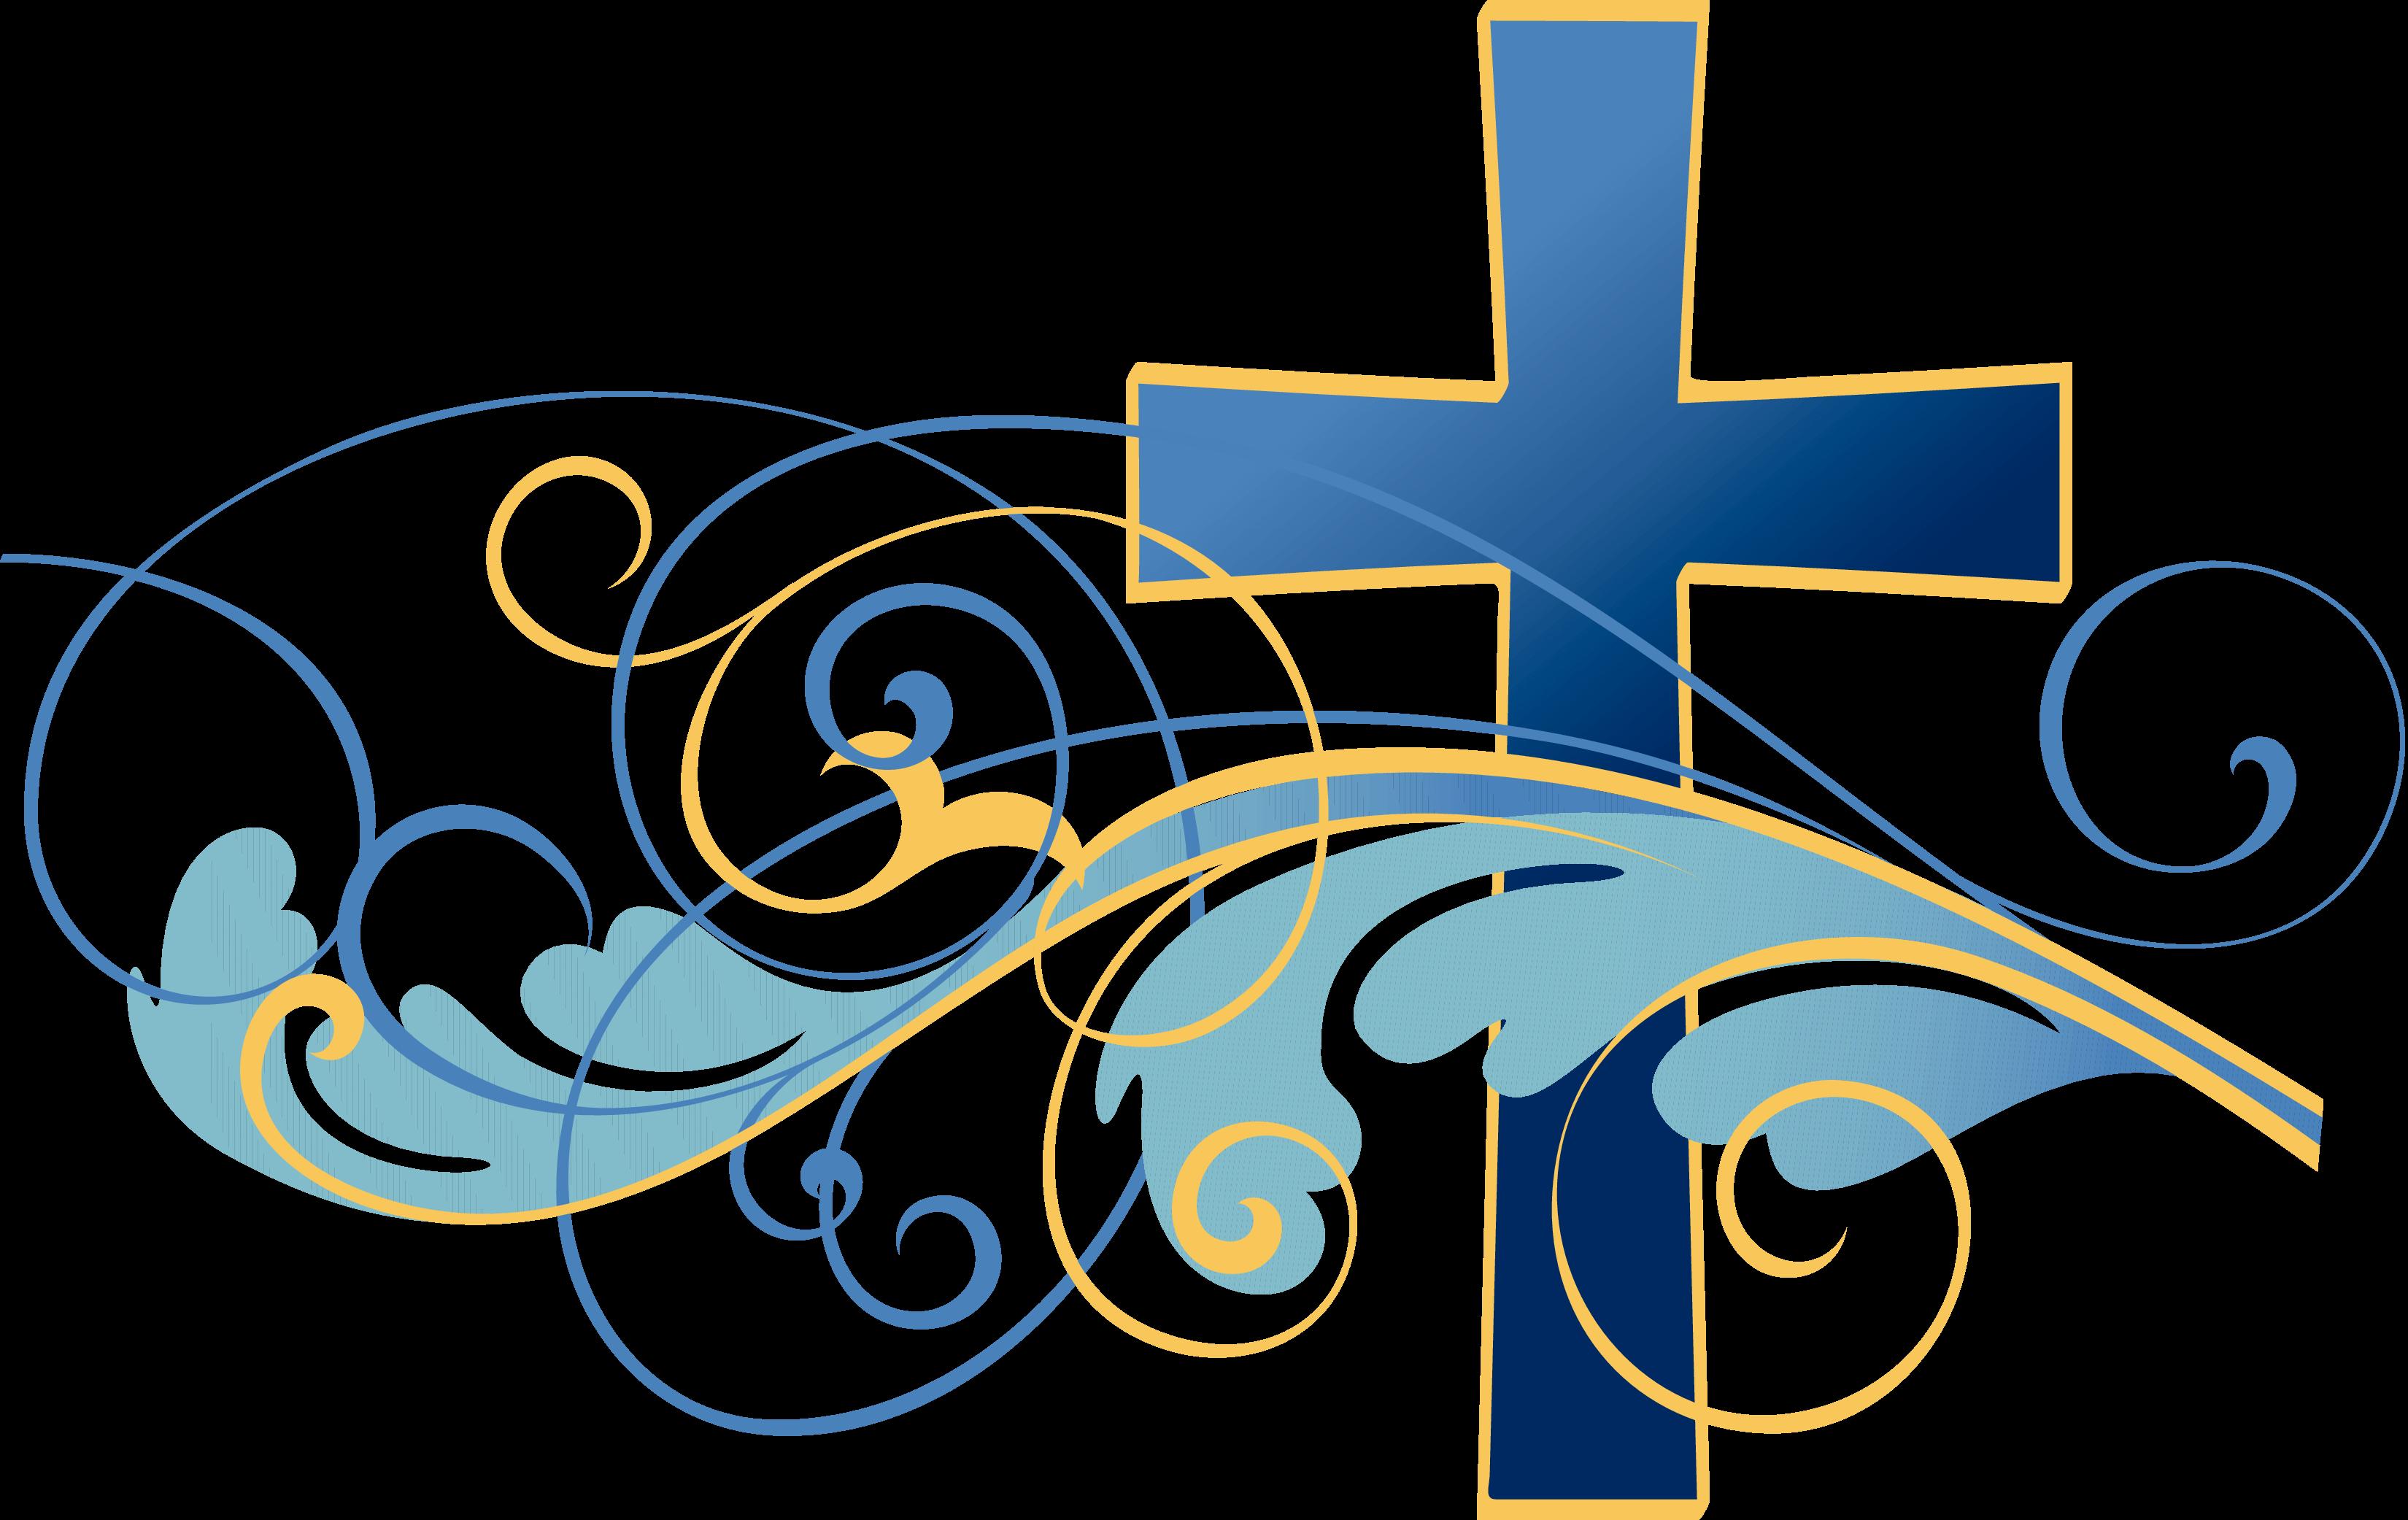 Christian Outreach Cliparts.